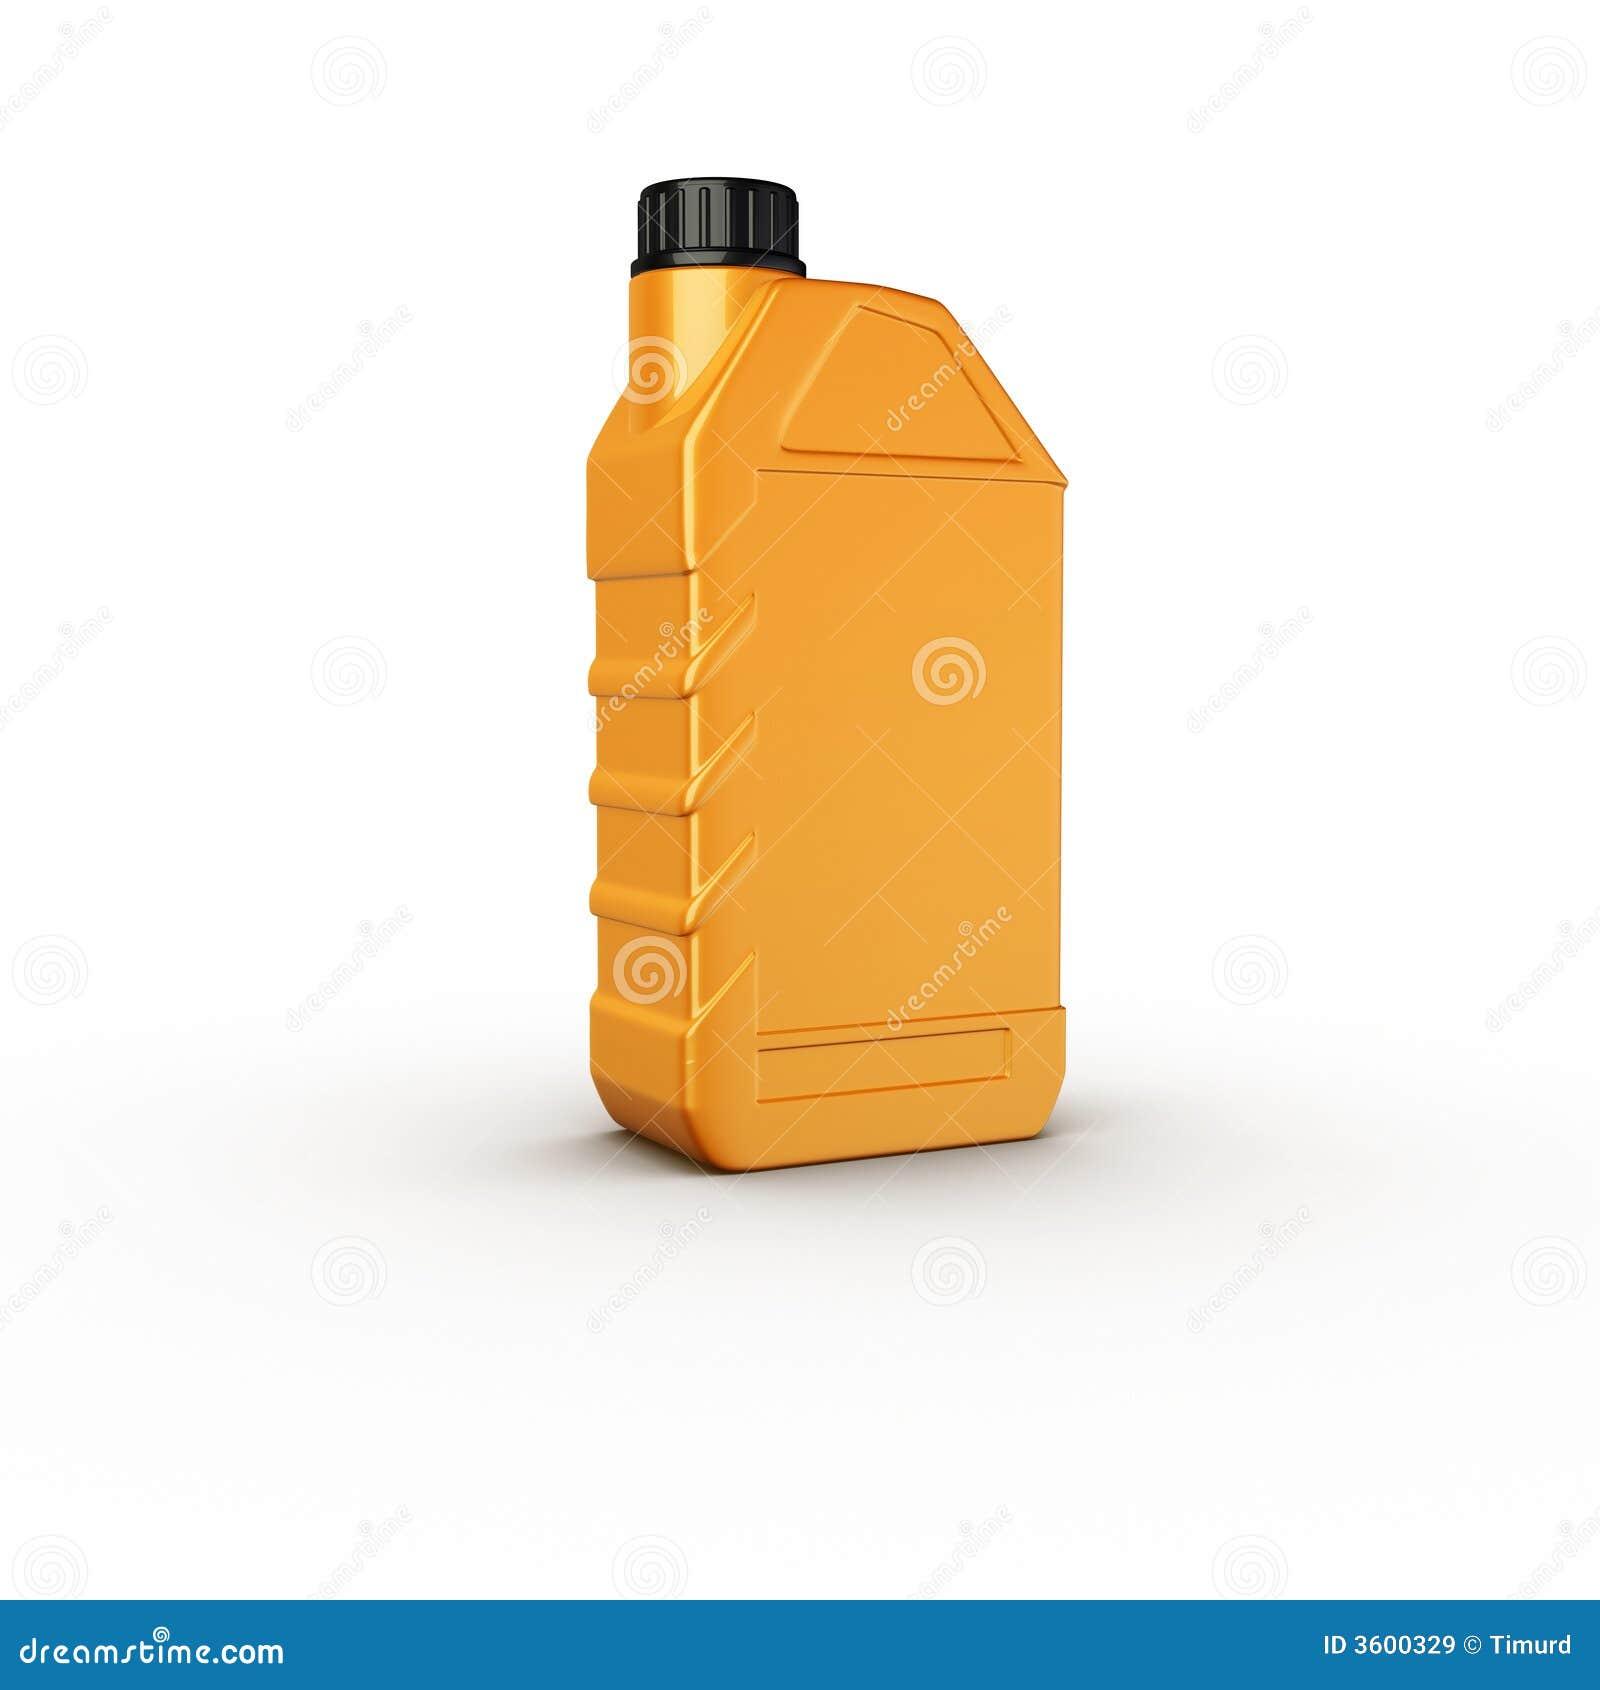 Motor Oil Bottle Royalty Free Stock Images Image 3600329